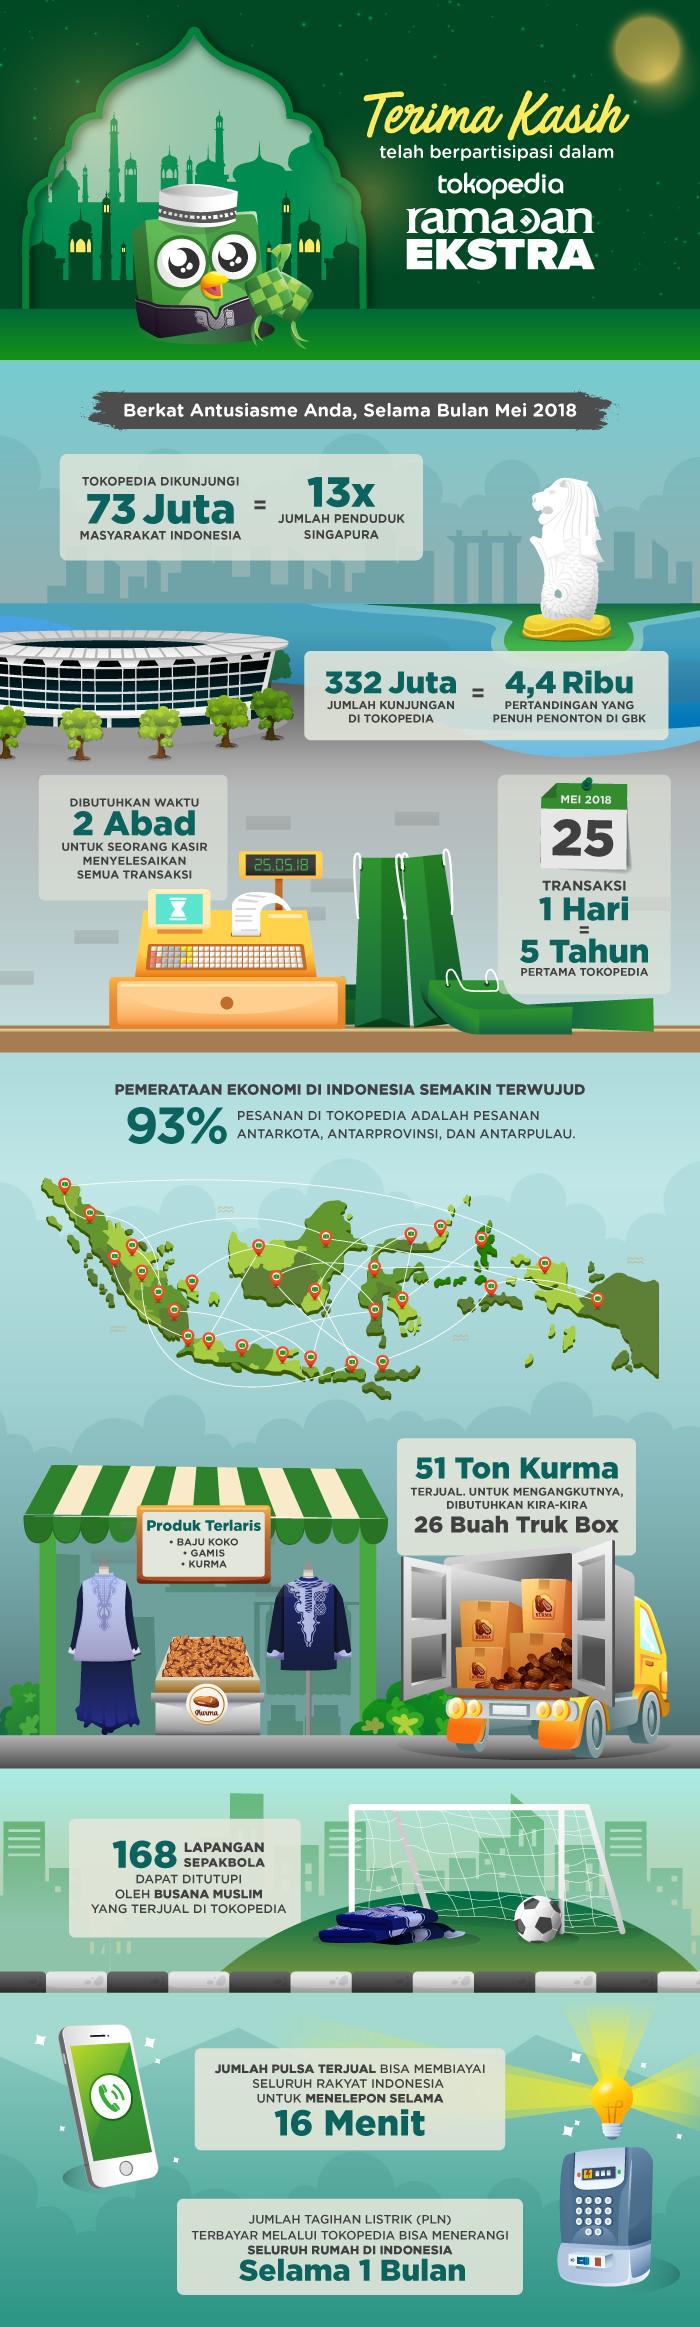 Infografis Ramadan Ekstra Tokopedia